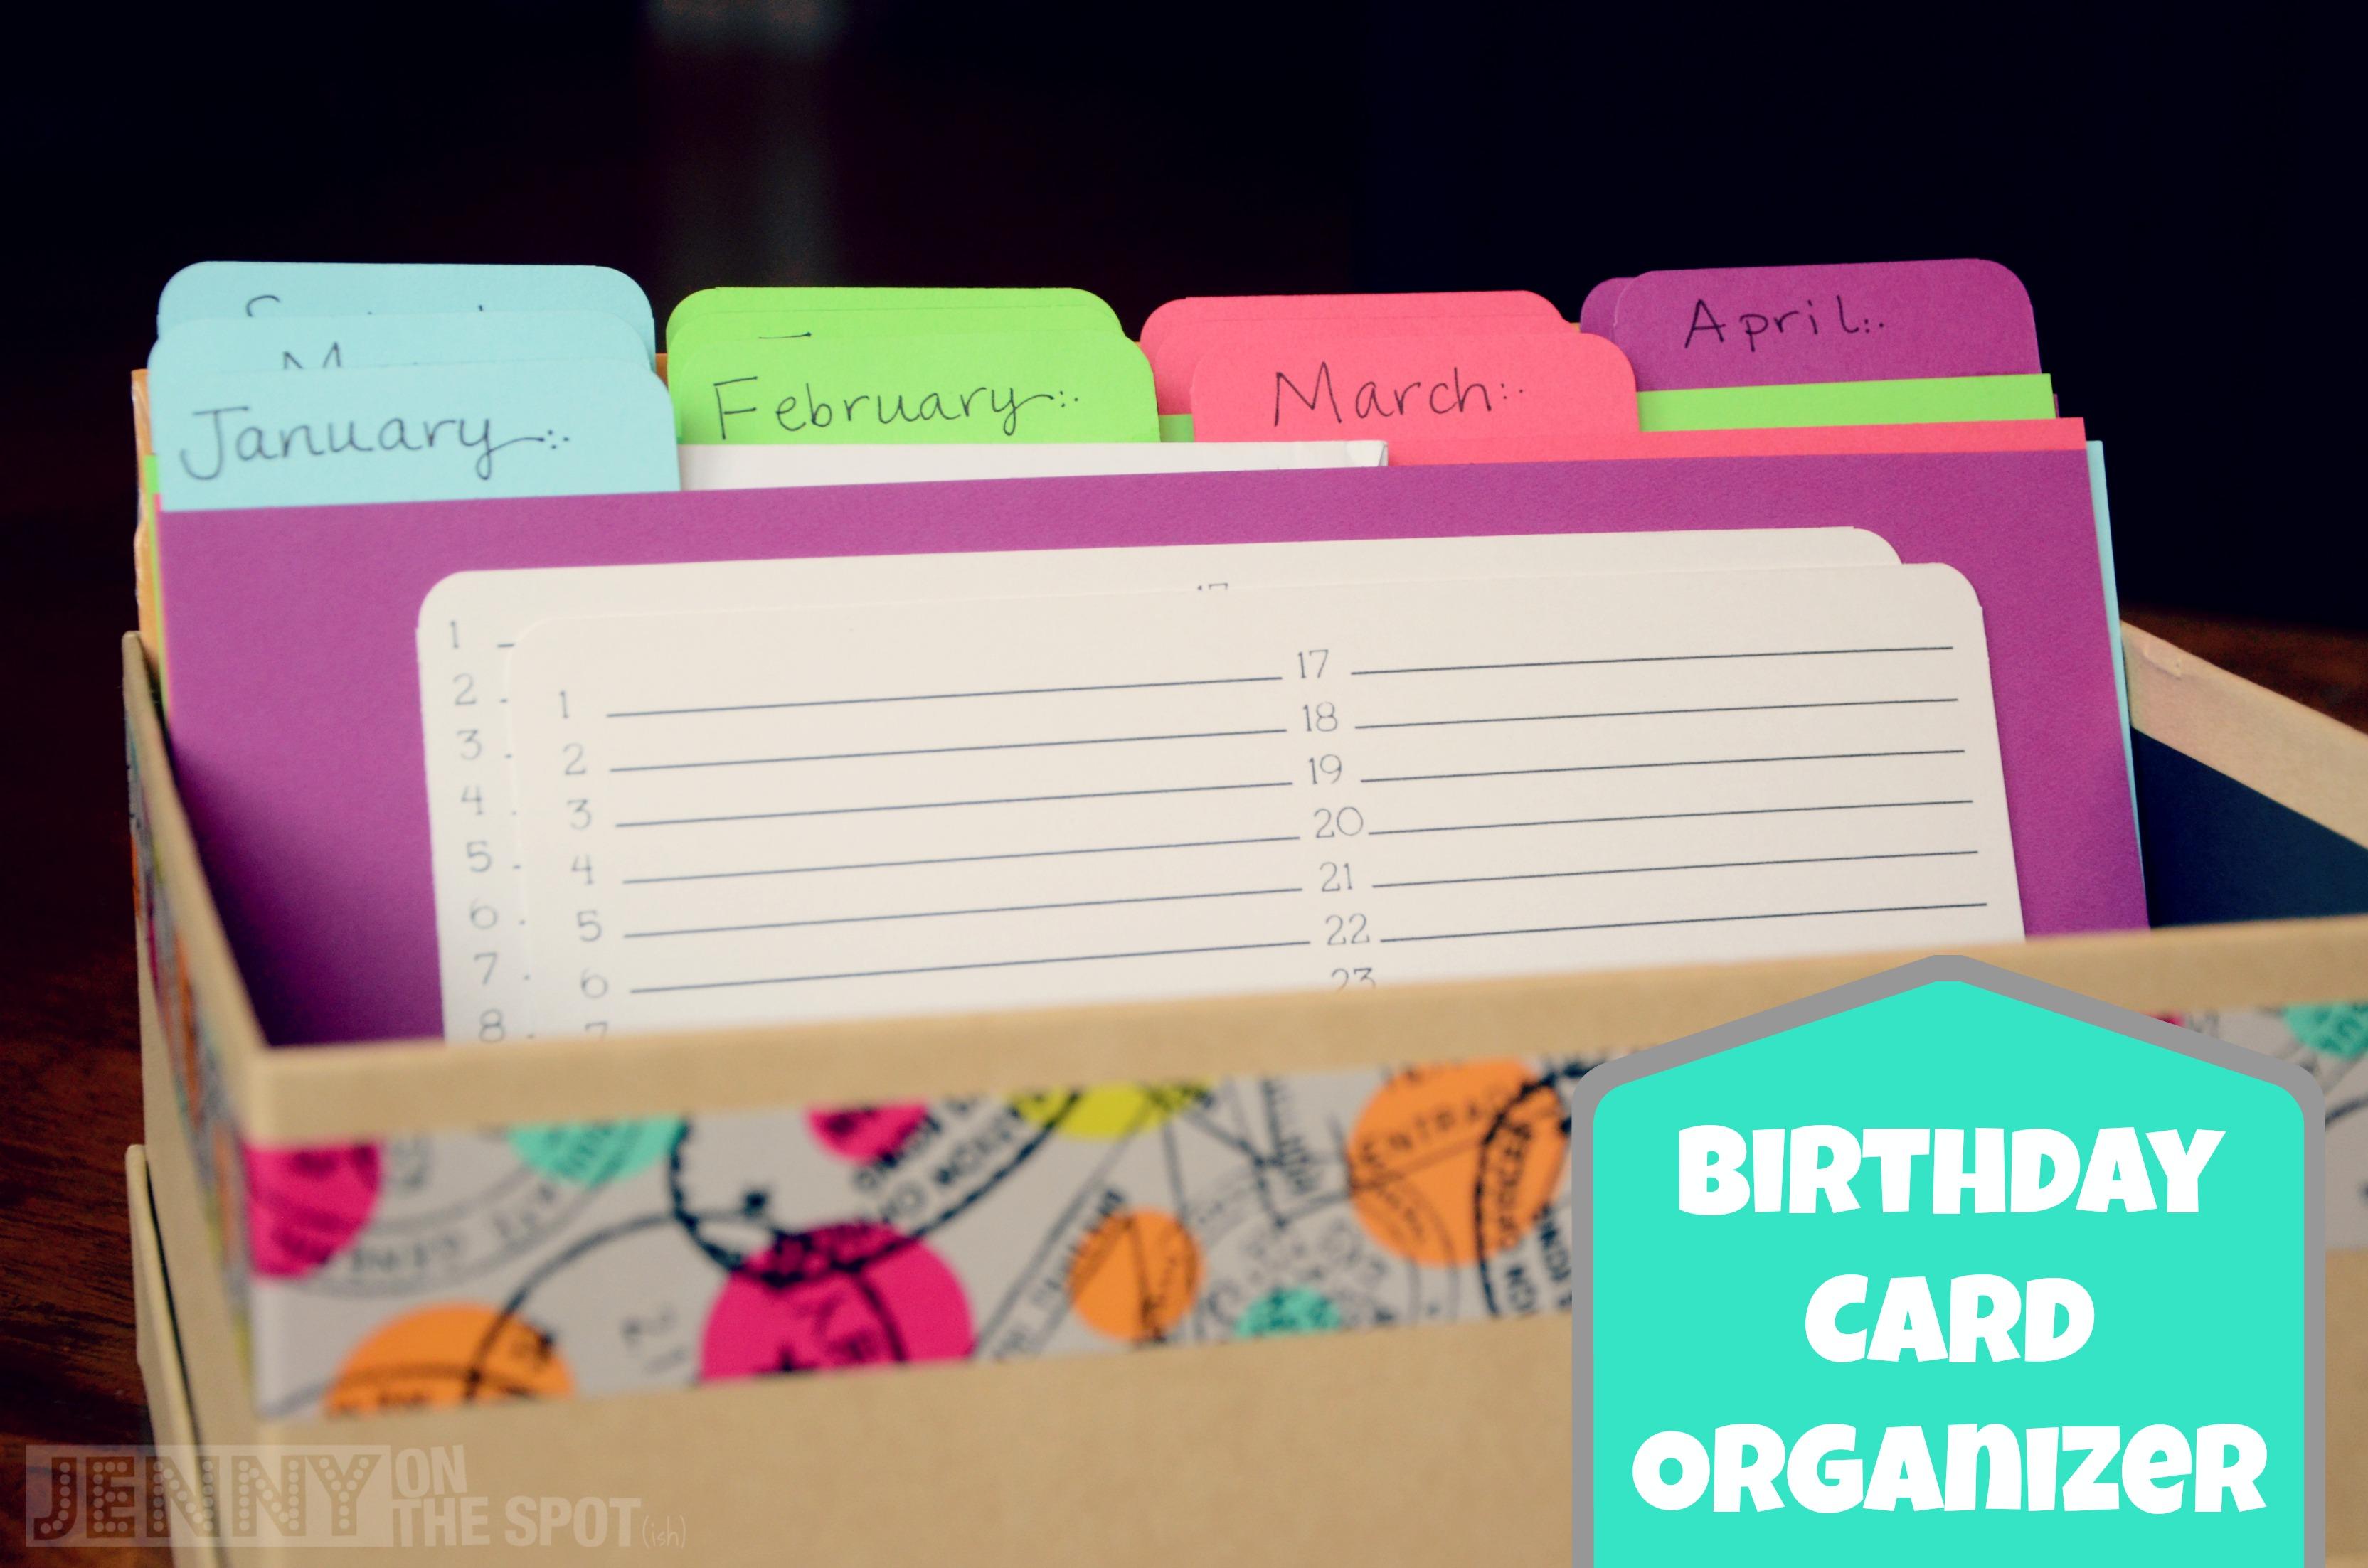 Birthday card organizer by @jennyonthespot